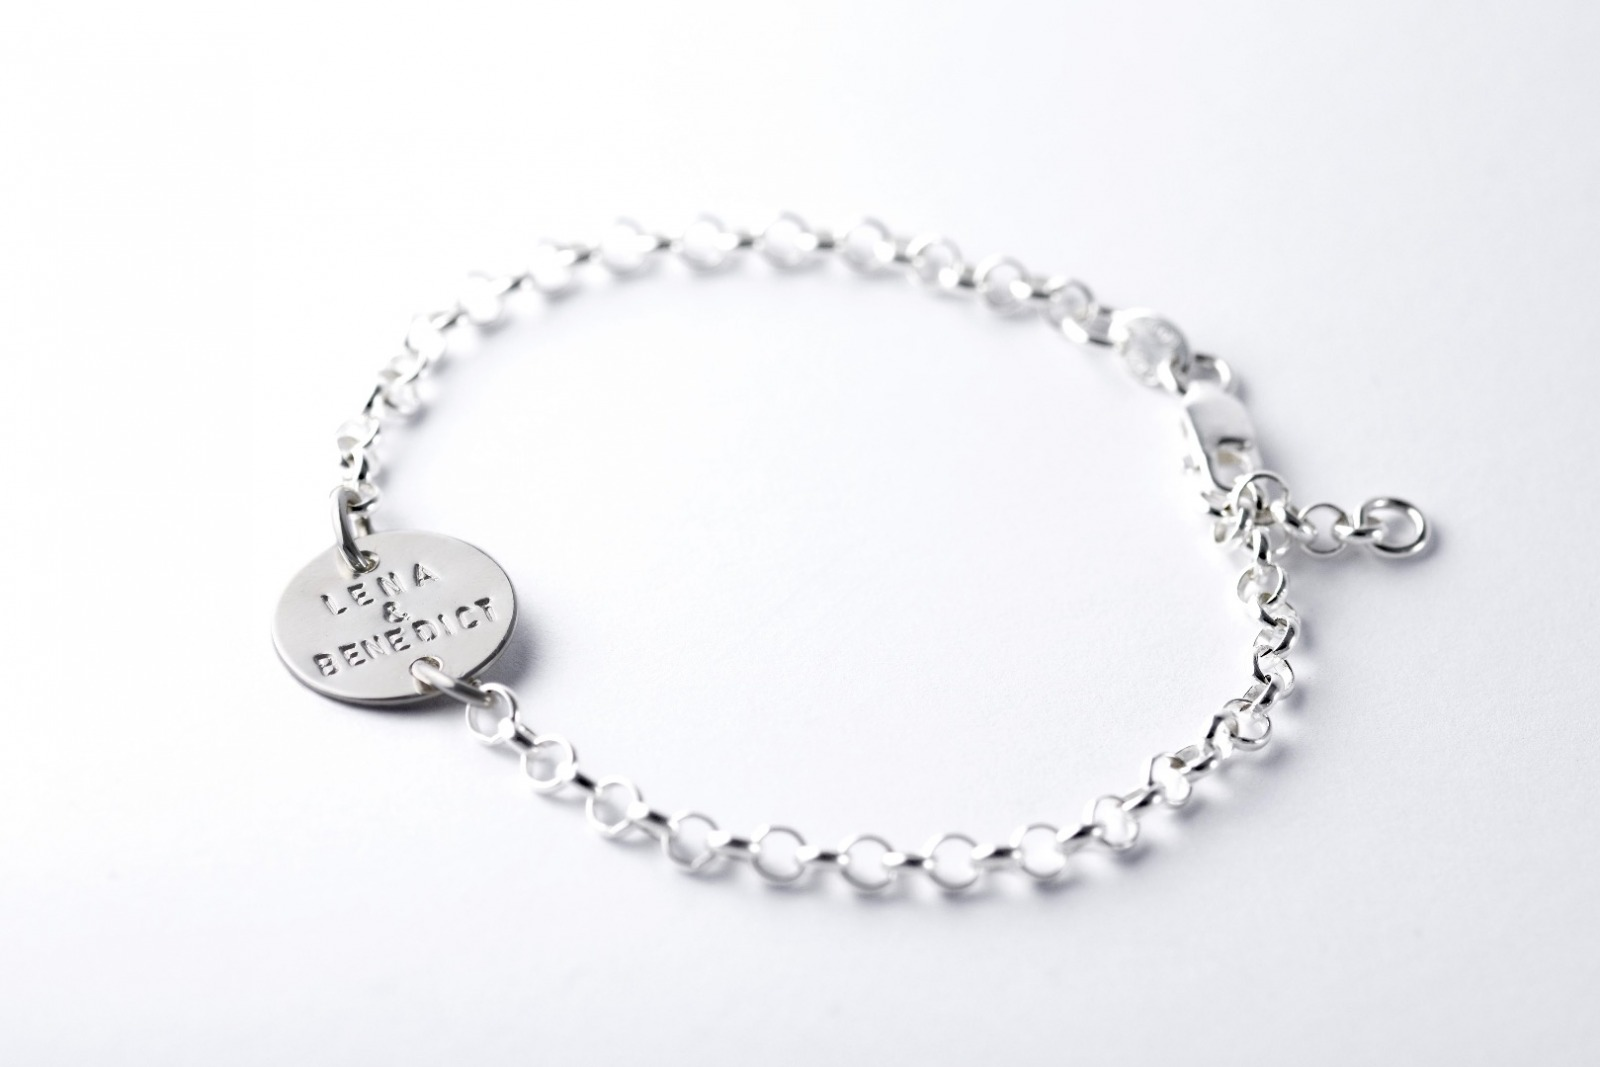 Silberarmband - Namens- Geburts- Spruchband